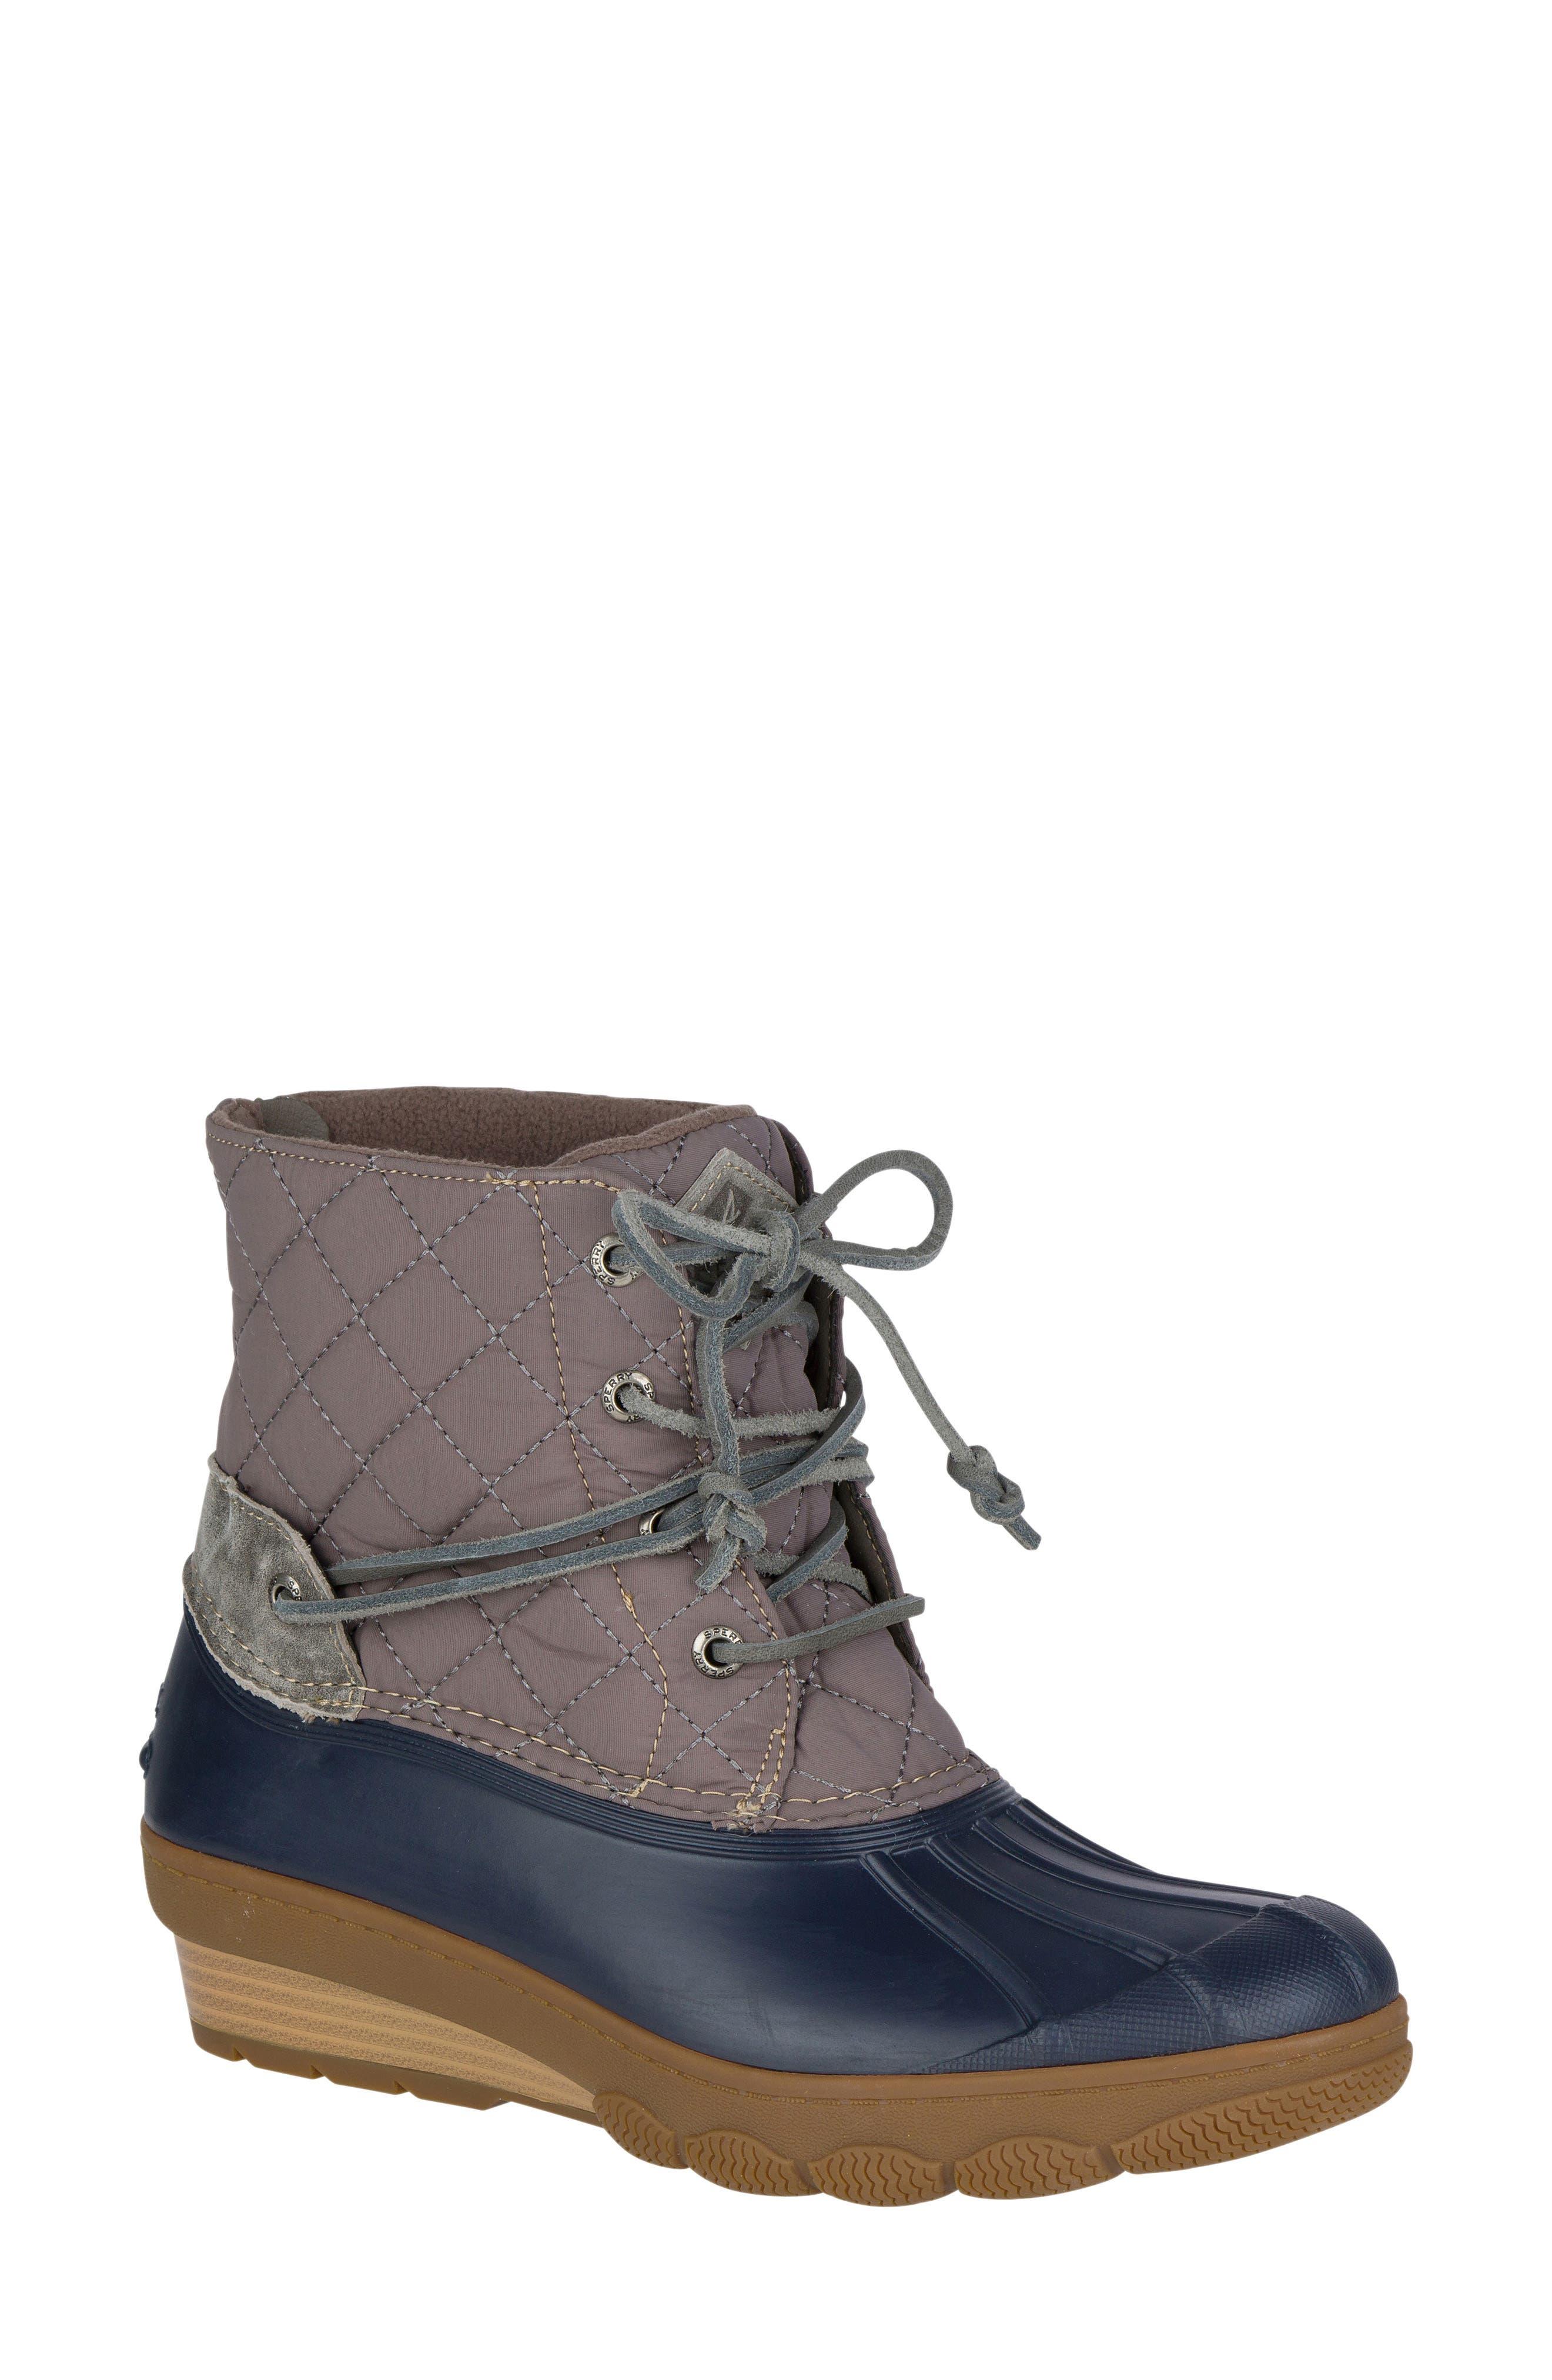 Main Image - Sperry Saltwater Quilted Watperproof Boot (Women)